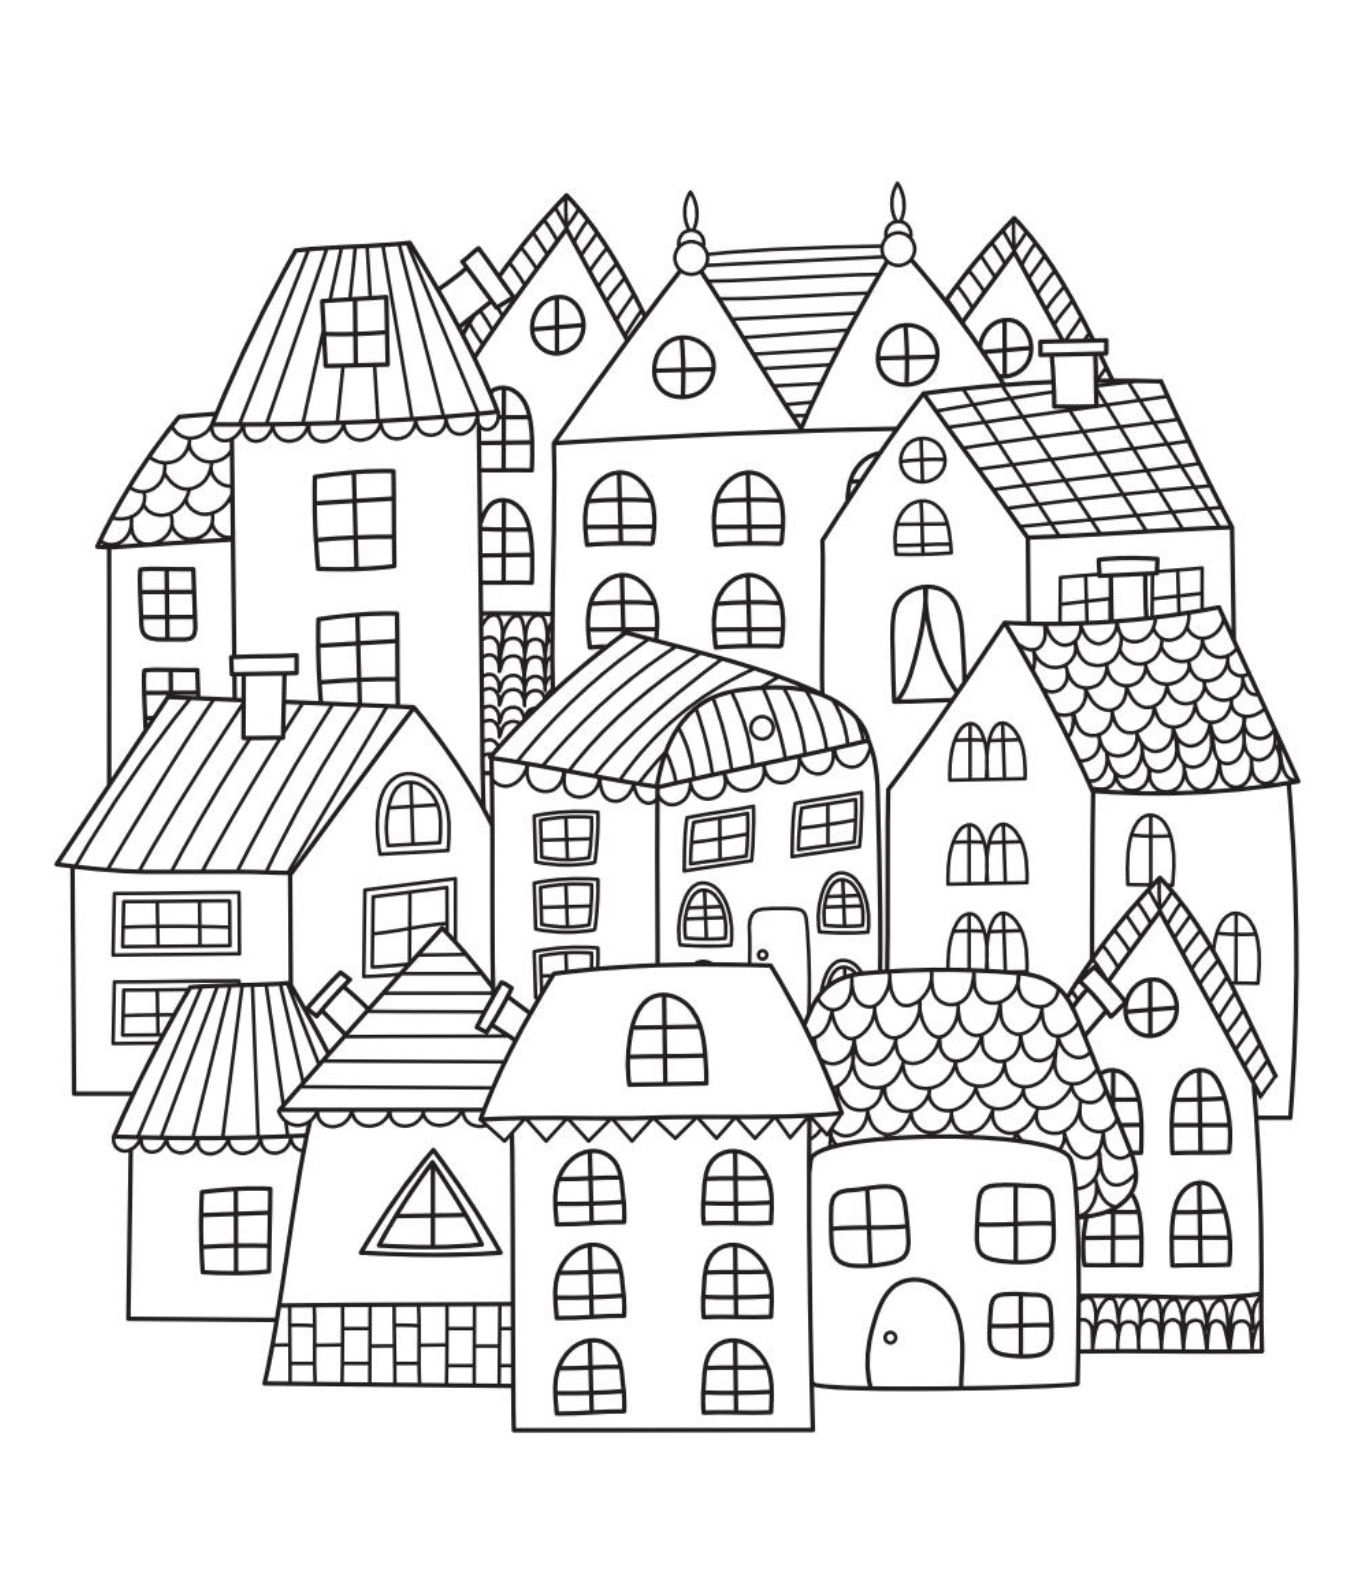 Pin de Riccarda en Disegni | Pinterest | Dibujo, Colorear y Dibujar